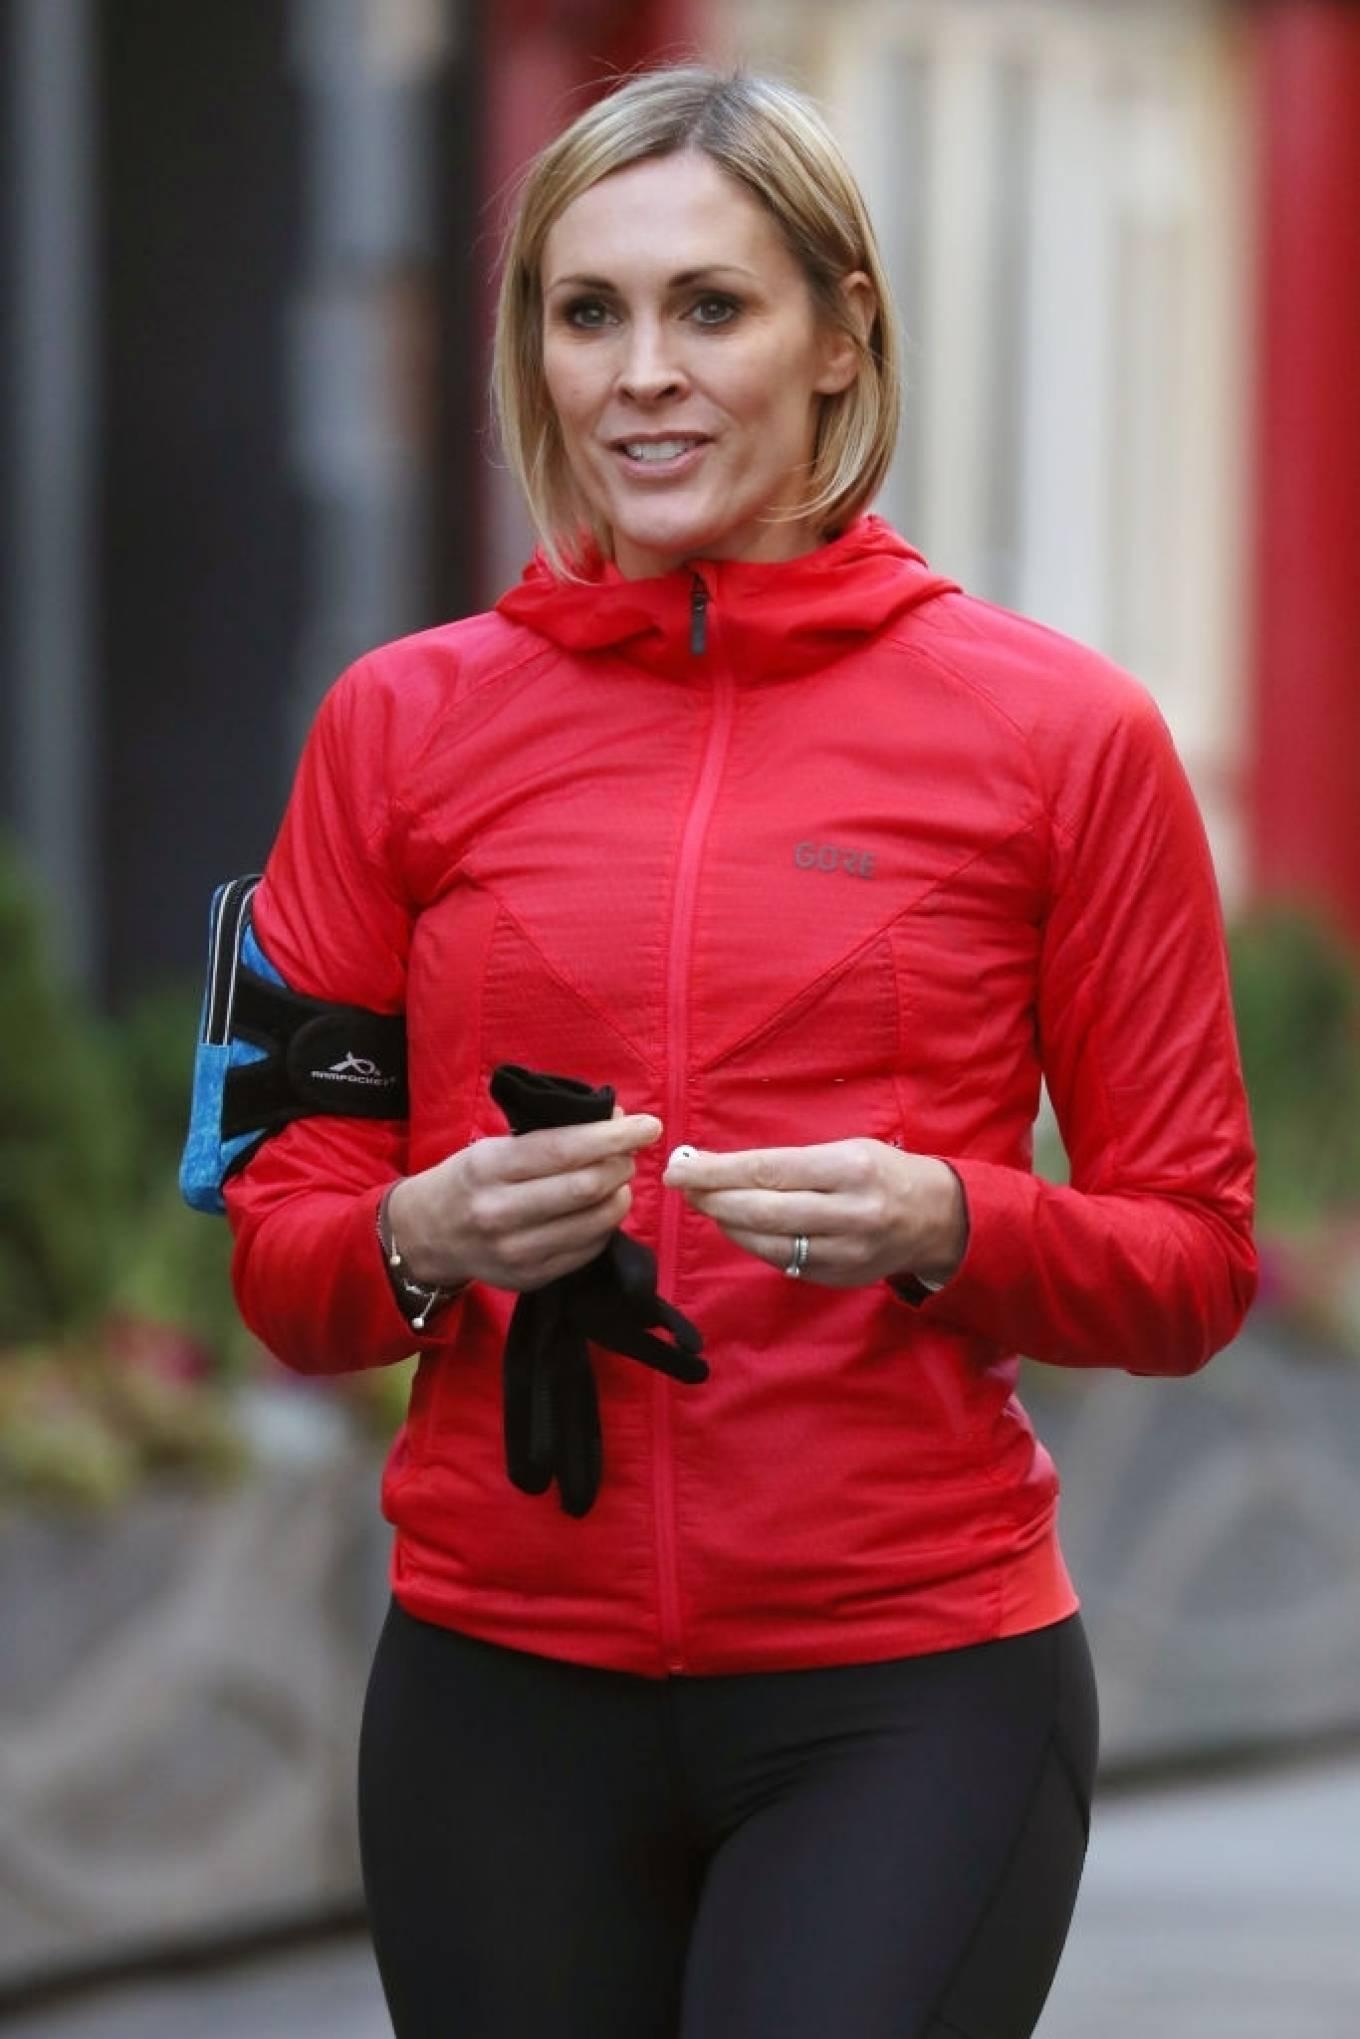 Jenni Falconer 2020 : Jenni Falconer – Looks sporty at Global Radio Studios in London -02